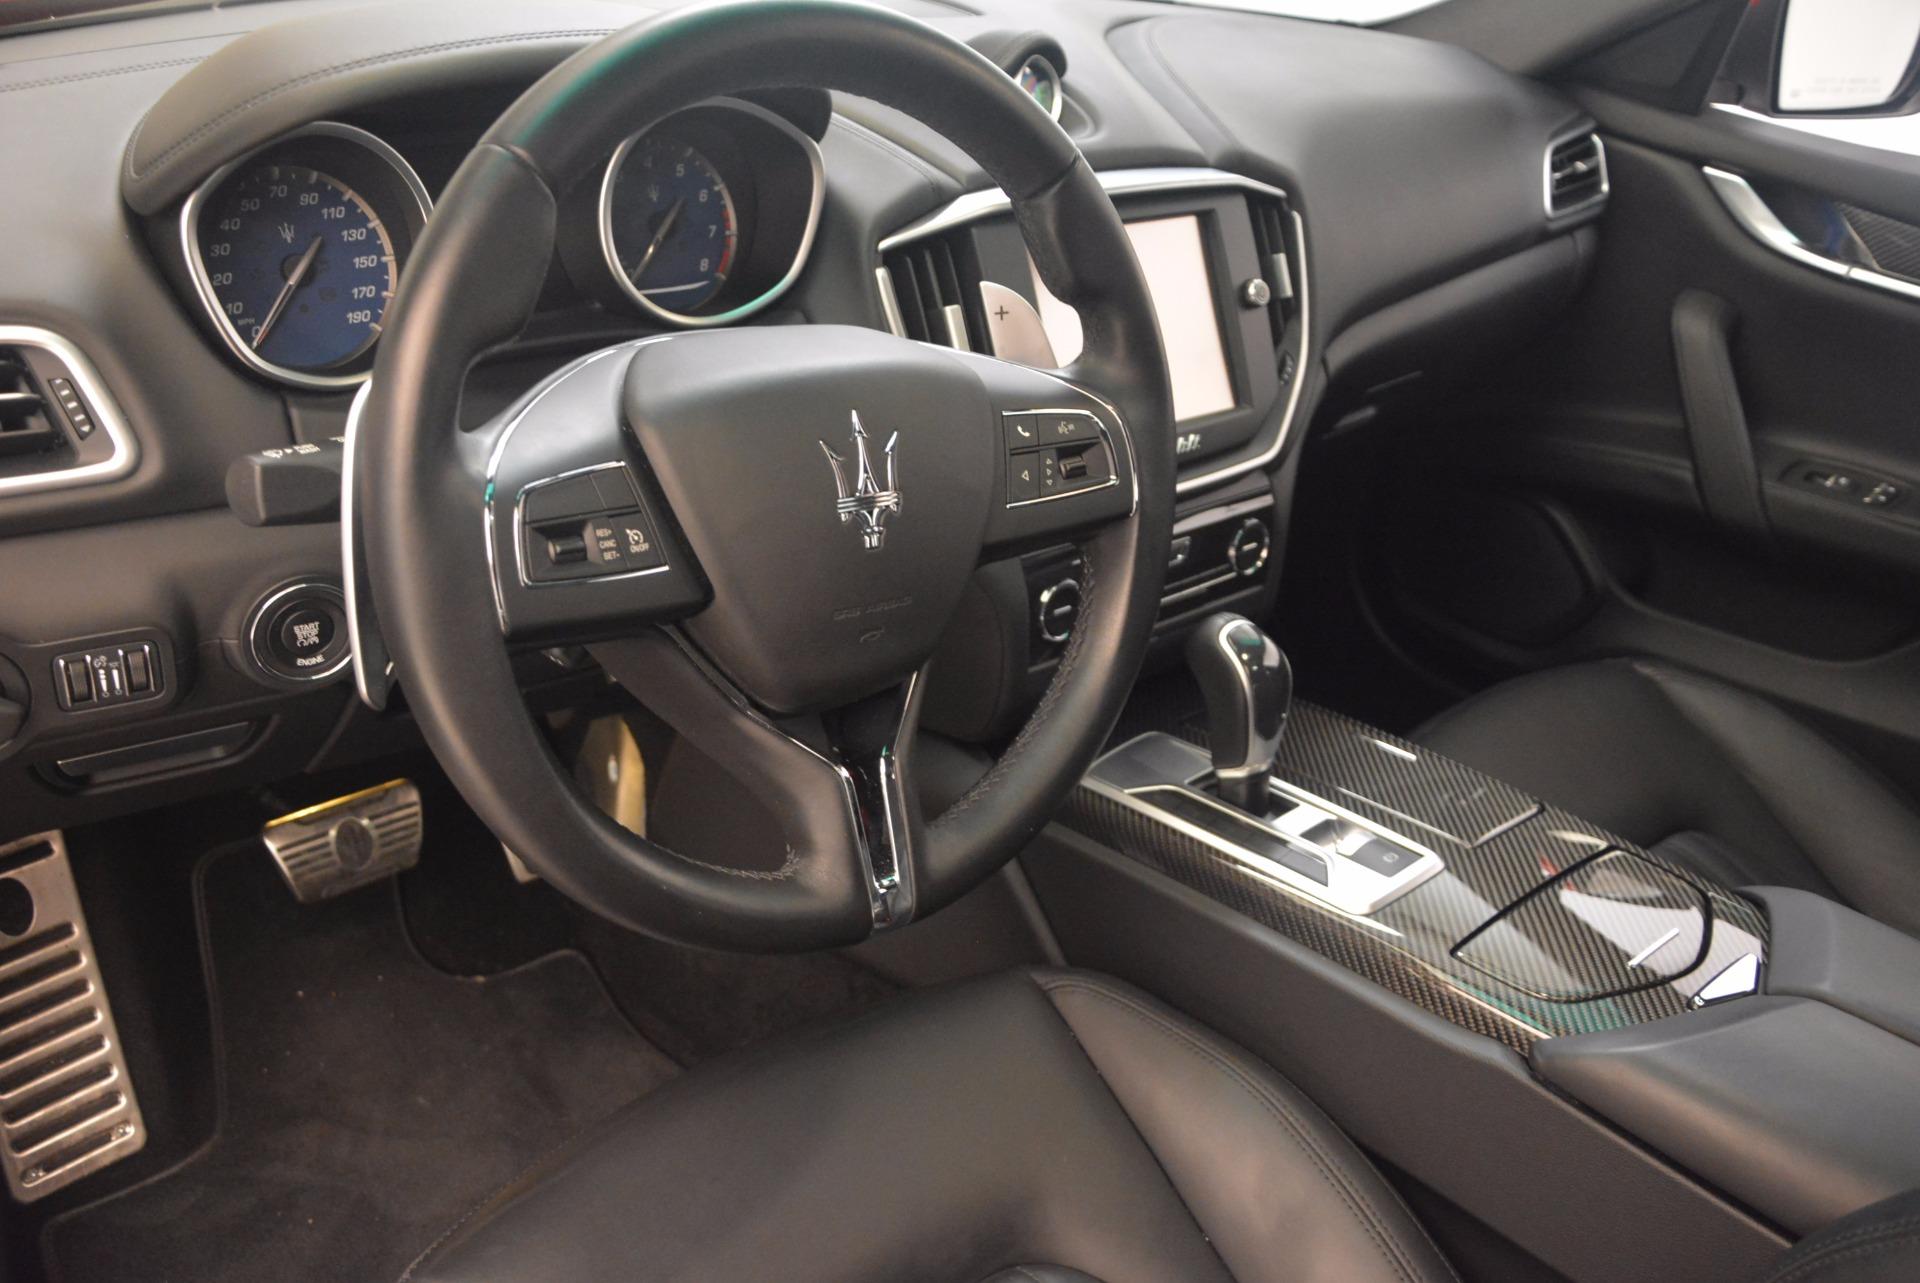 Used 2014 Maserati Ghibli S Q4 For Sale In Greenwich, CT. Alfa Romeo of Greenwich, 7203 1158_p13